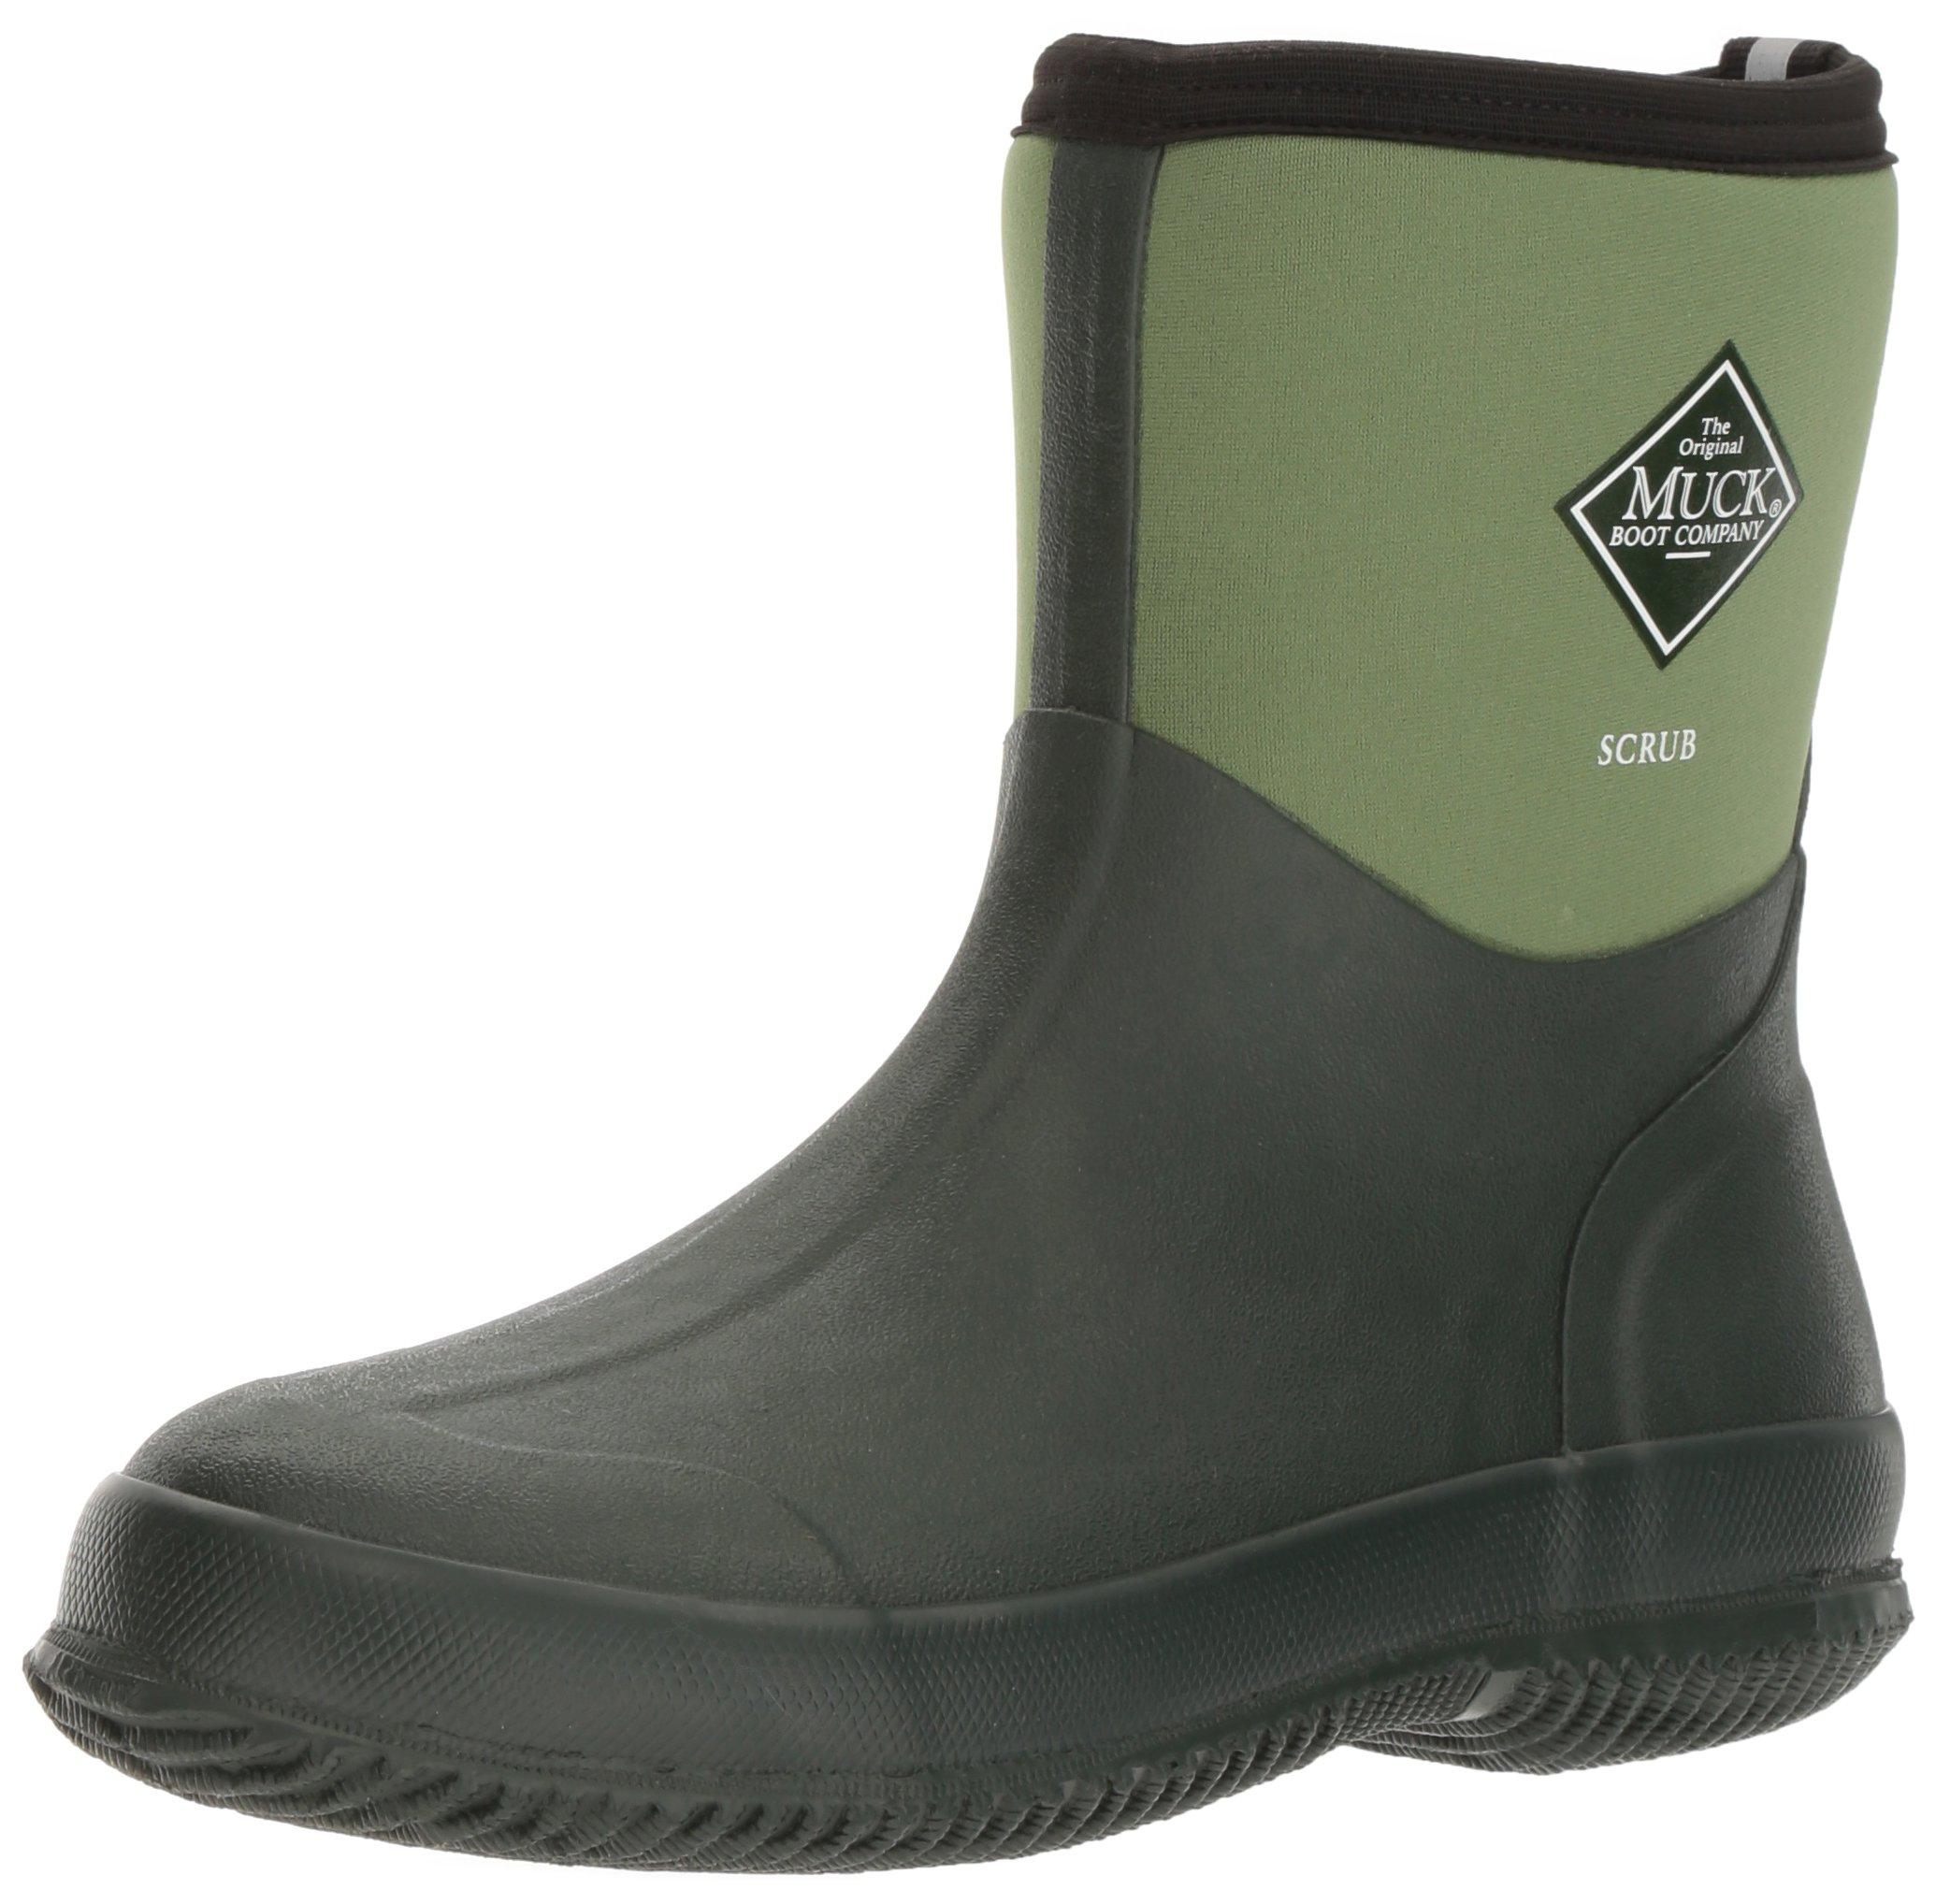 The Original MuckBoots Adult Scrub Boot,Garden Green,11 M US Mens/12 M US Womens by Muck Boot